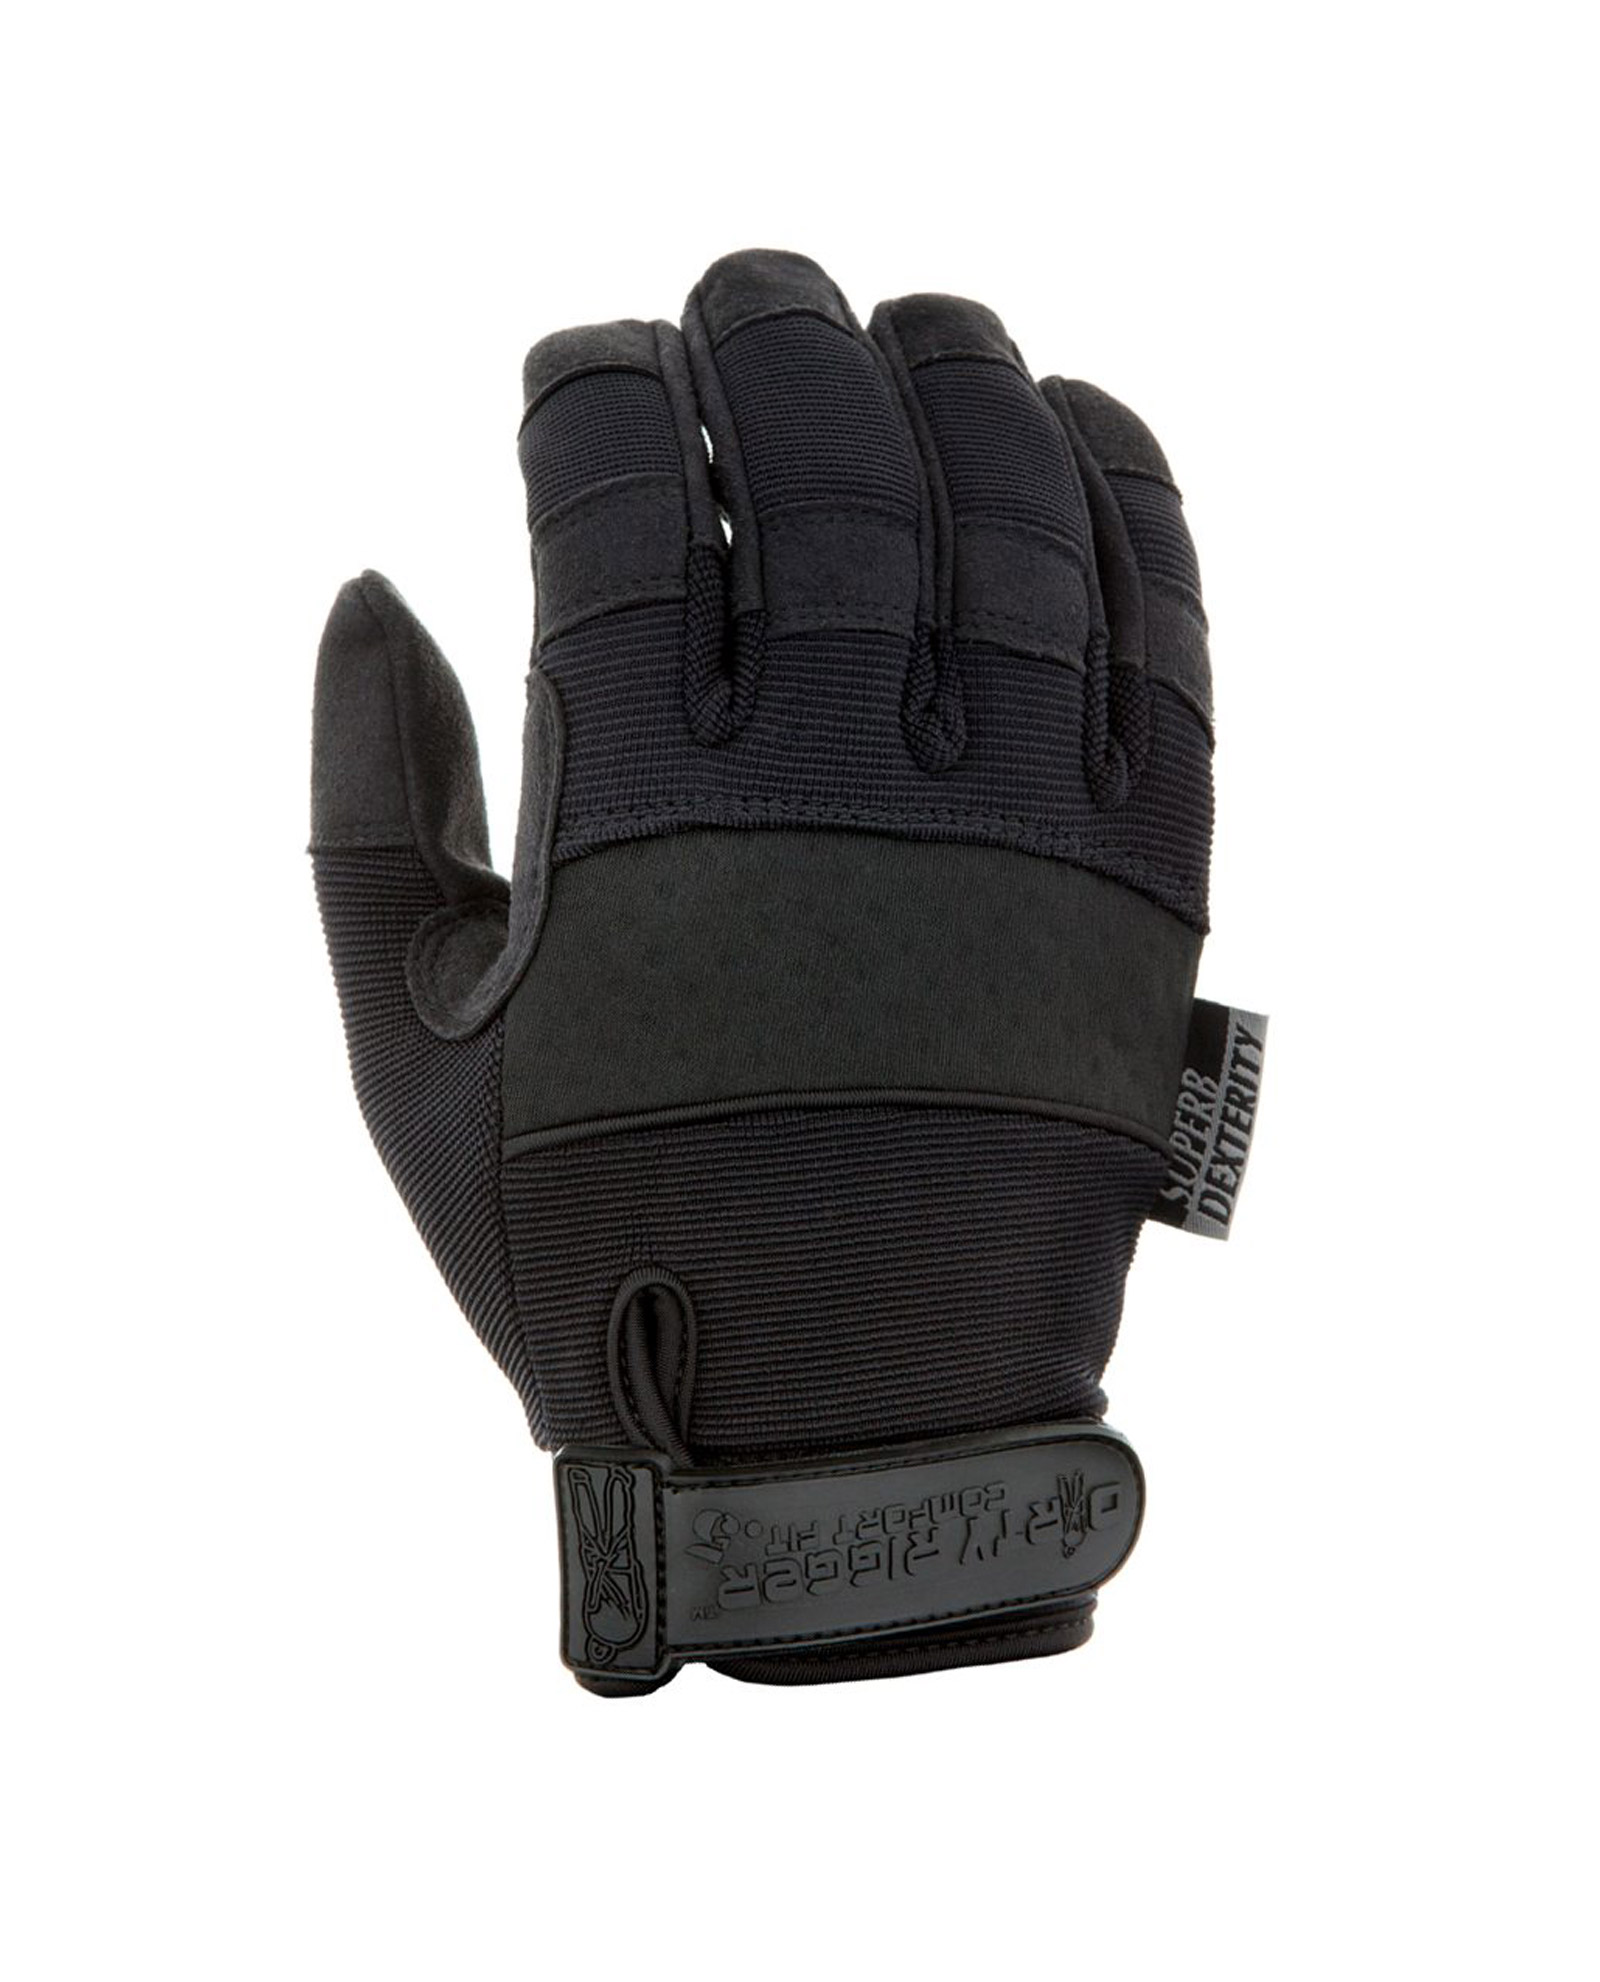 Dirty Rigger Glove Dty Comf0.5 Comfort Fit 0.5 High Dexterity Glove